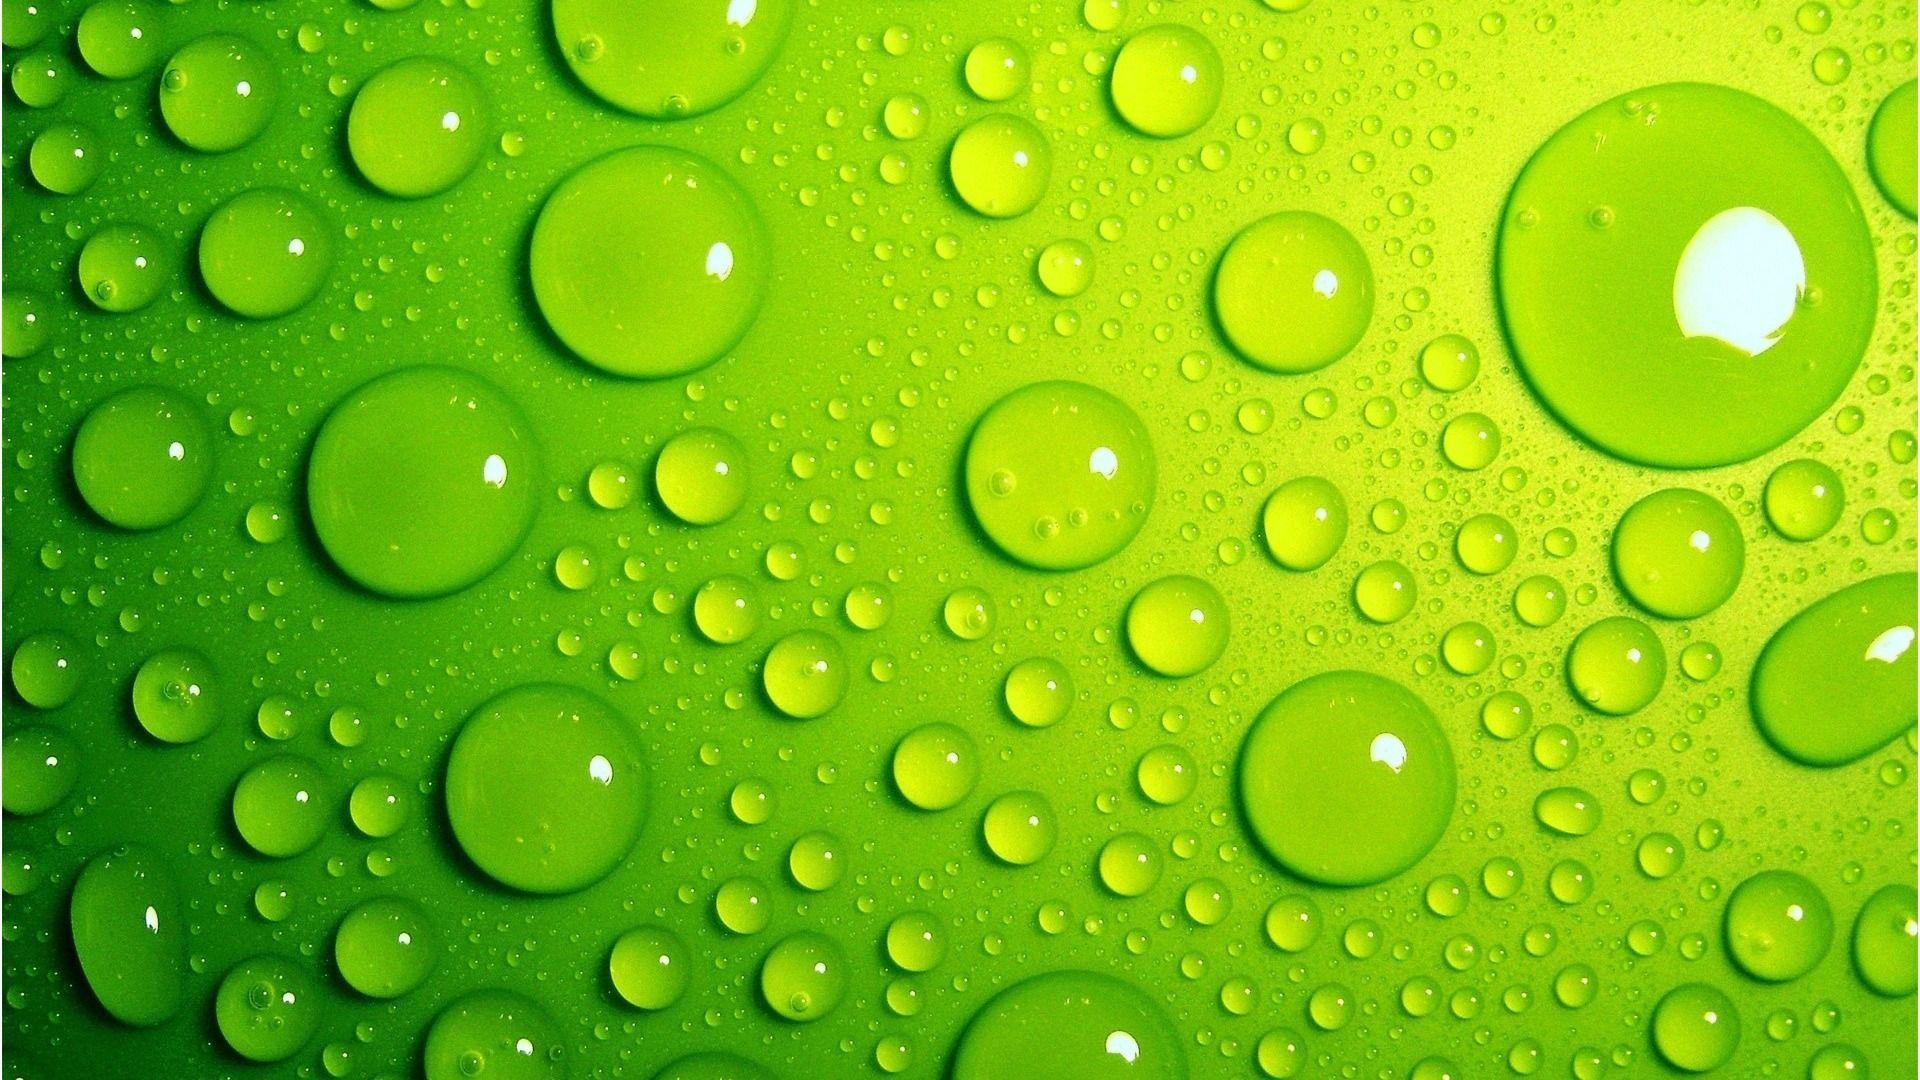 Wallpaper Desktop Green, Drop On Green Background